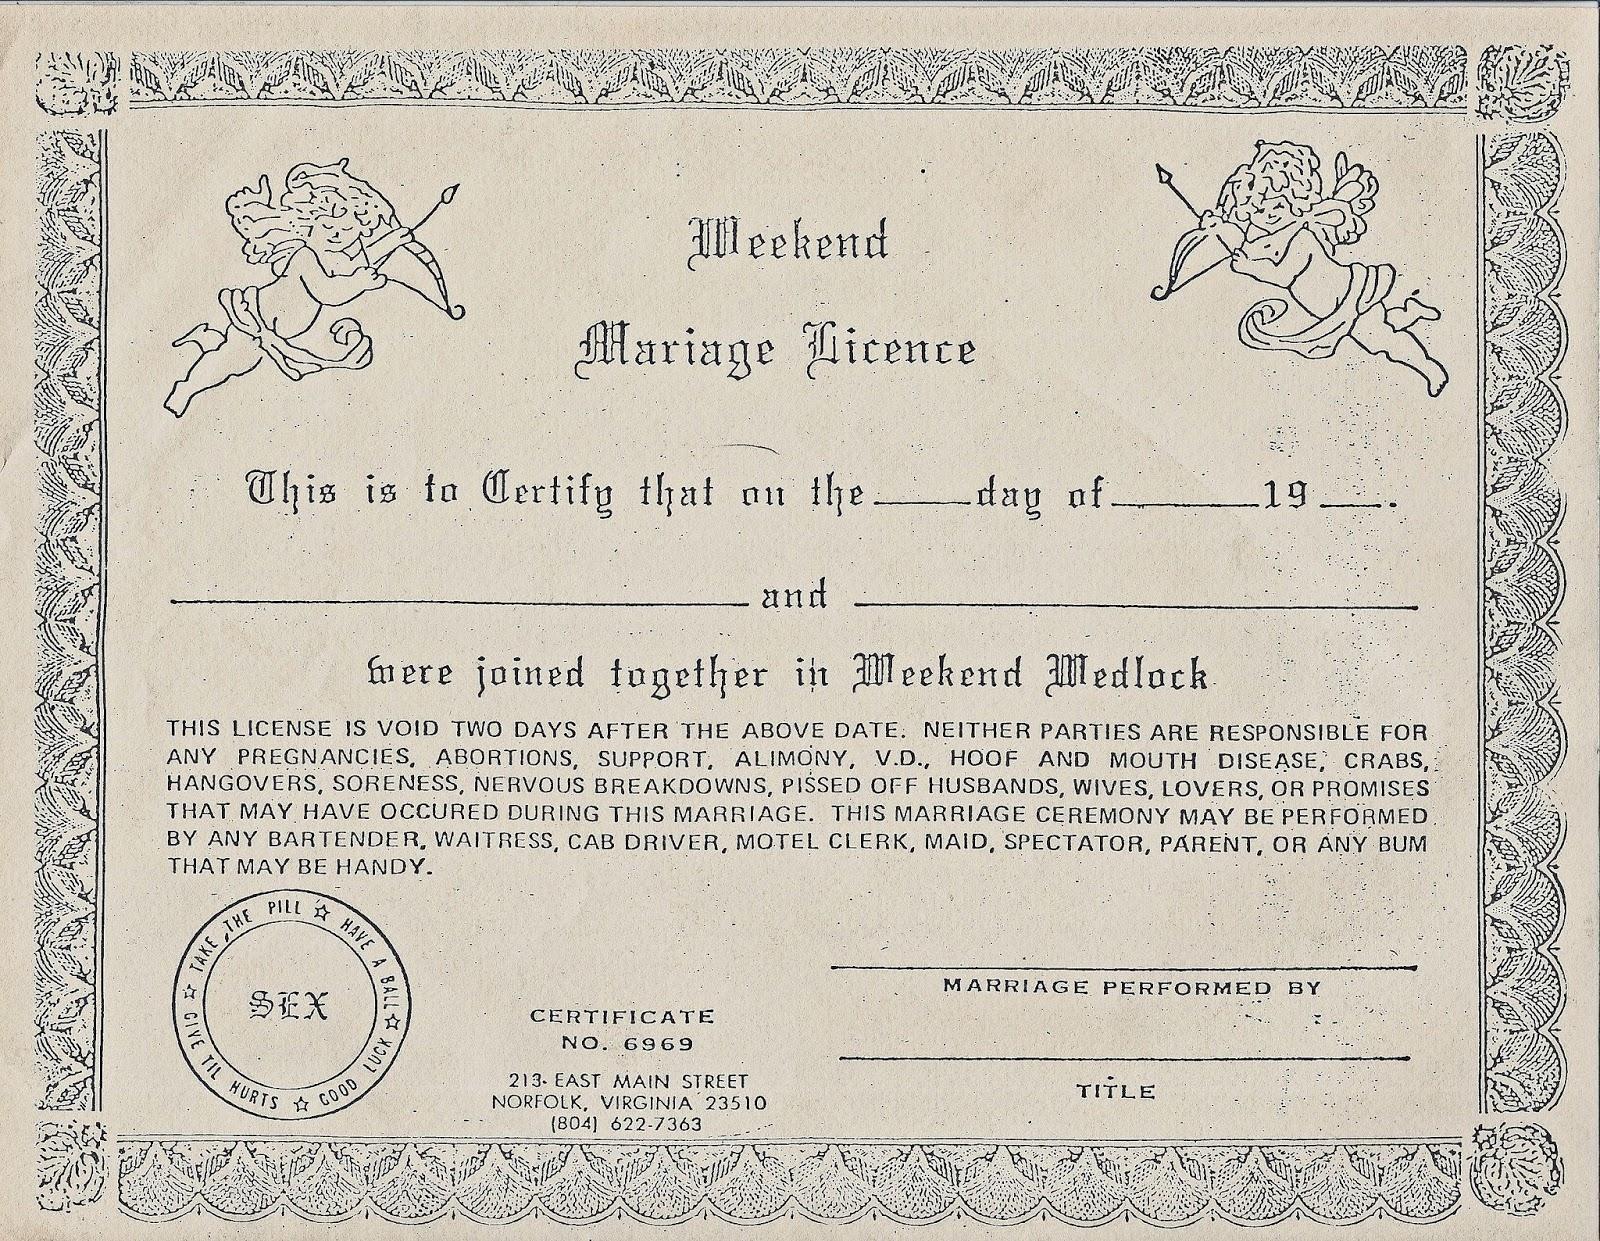 marriage certificate - solarfm.tk